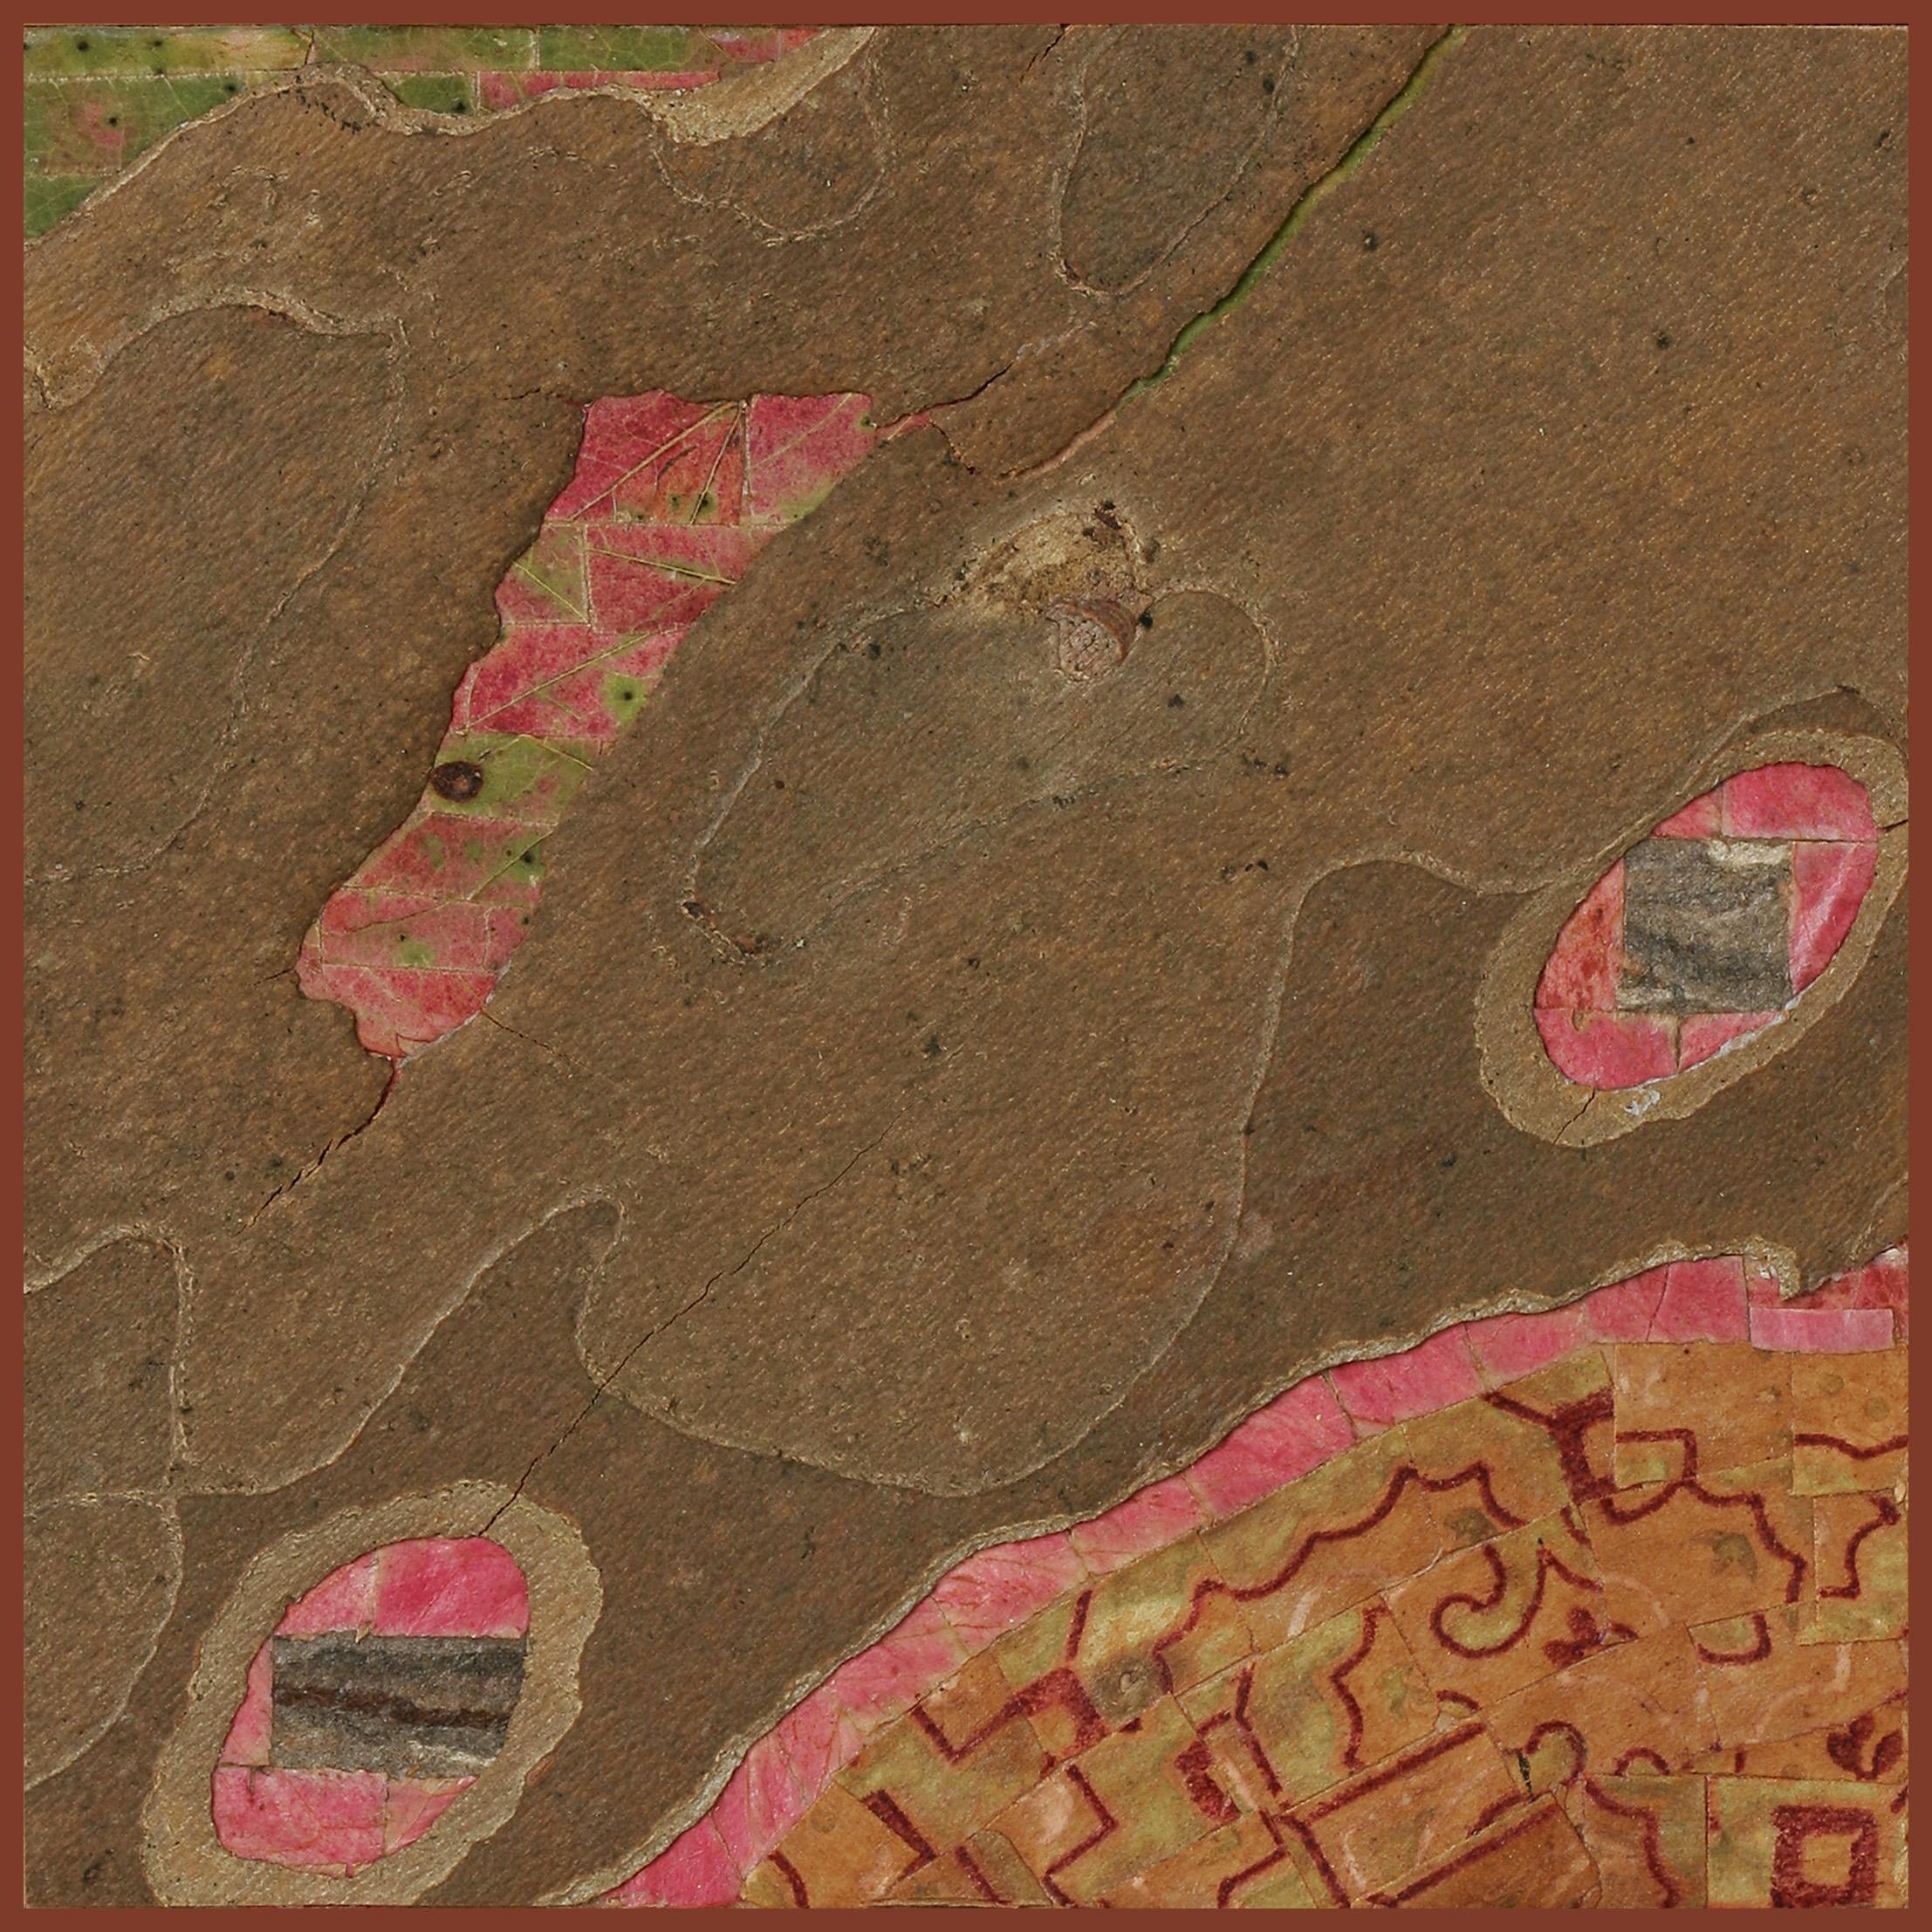 Reservoir Map